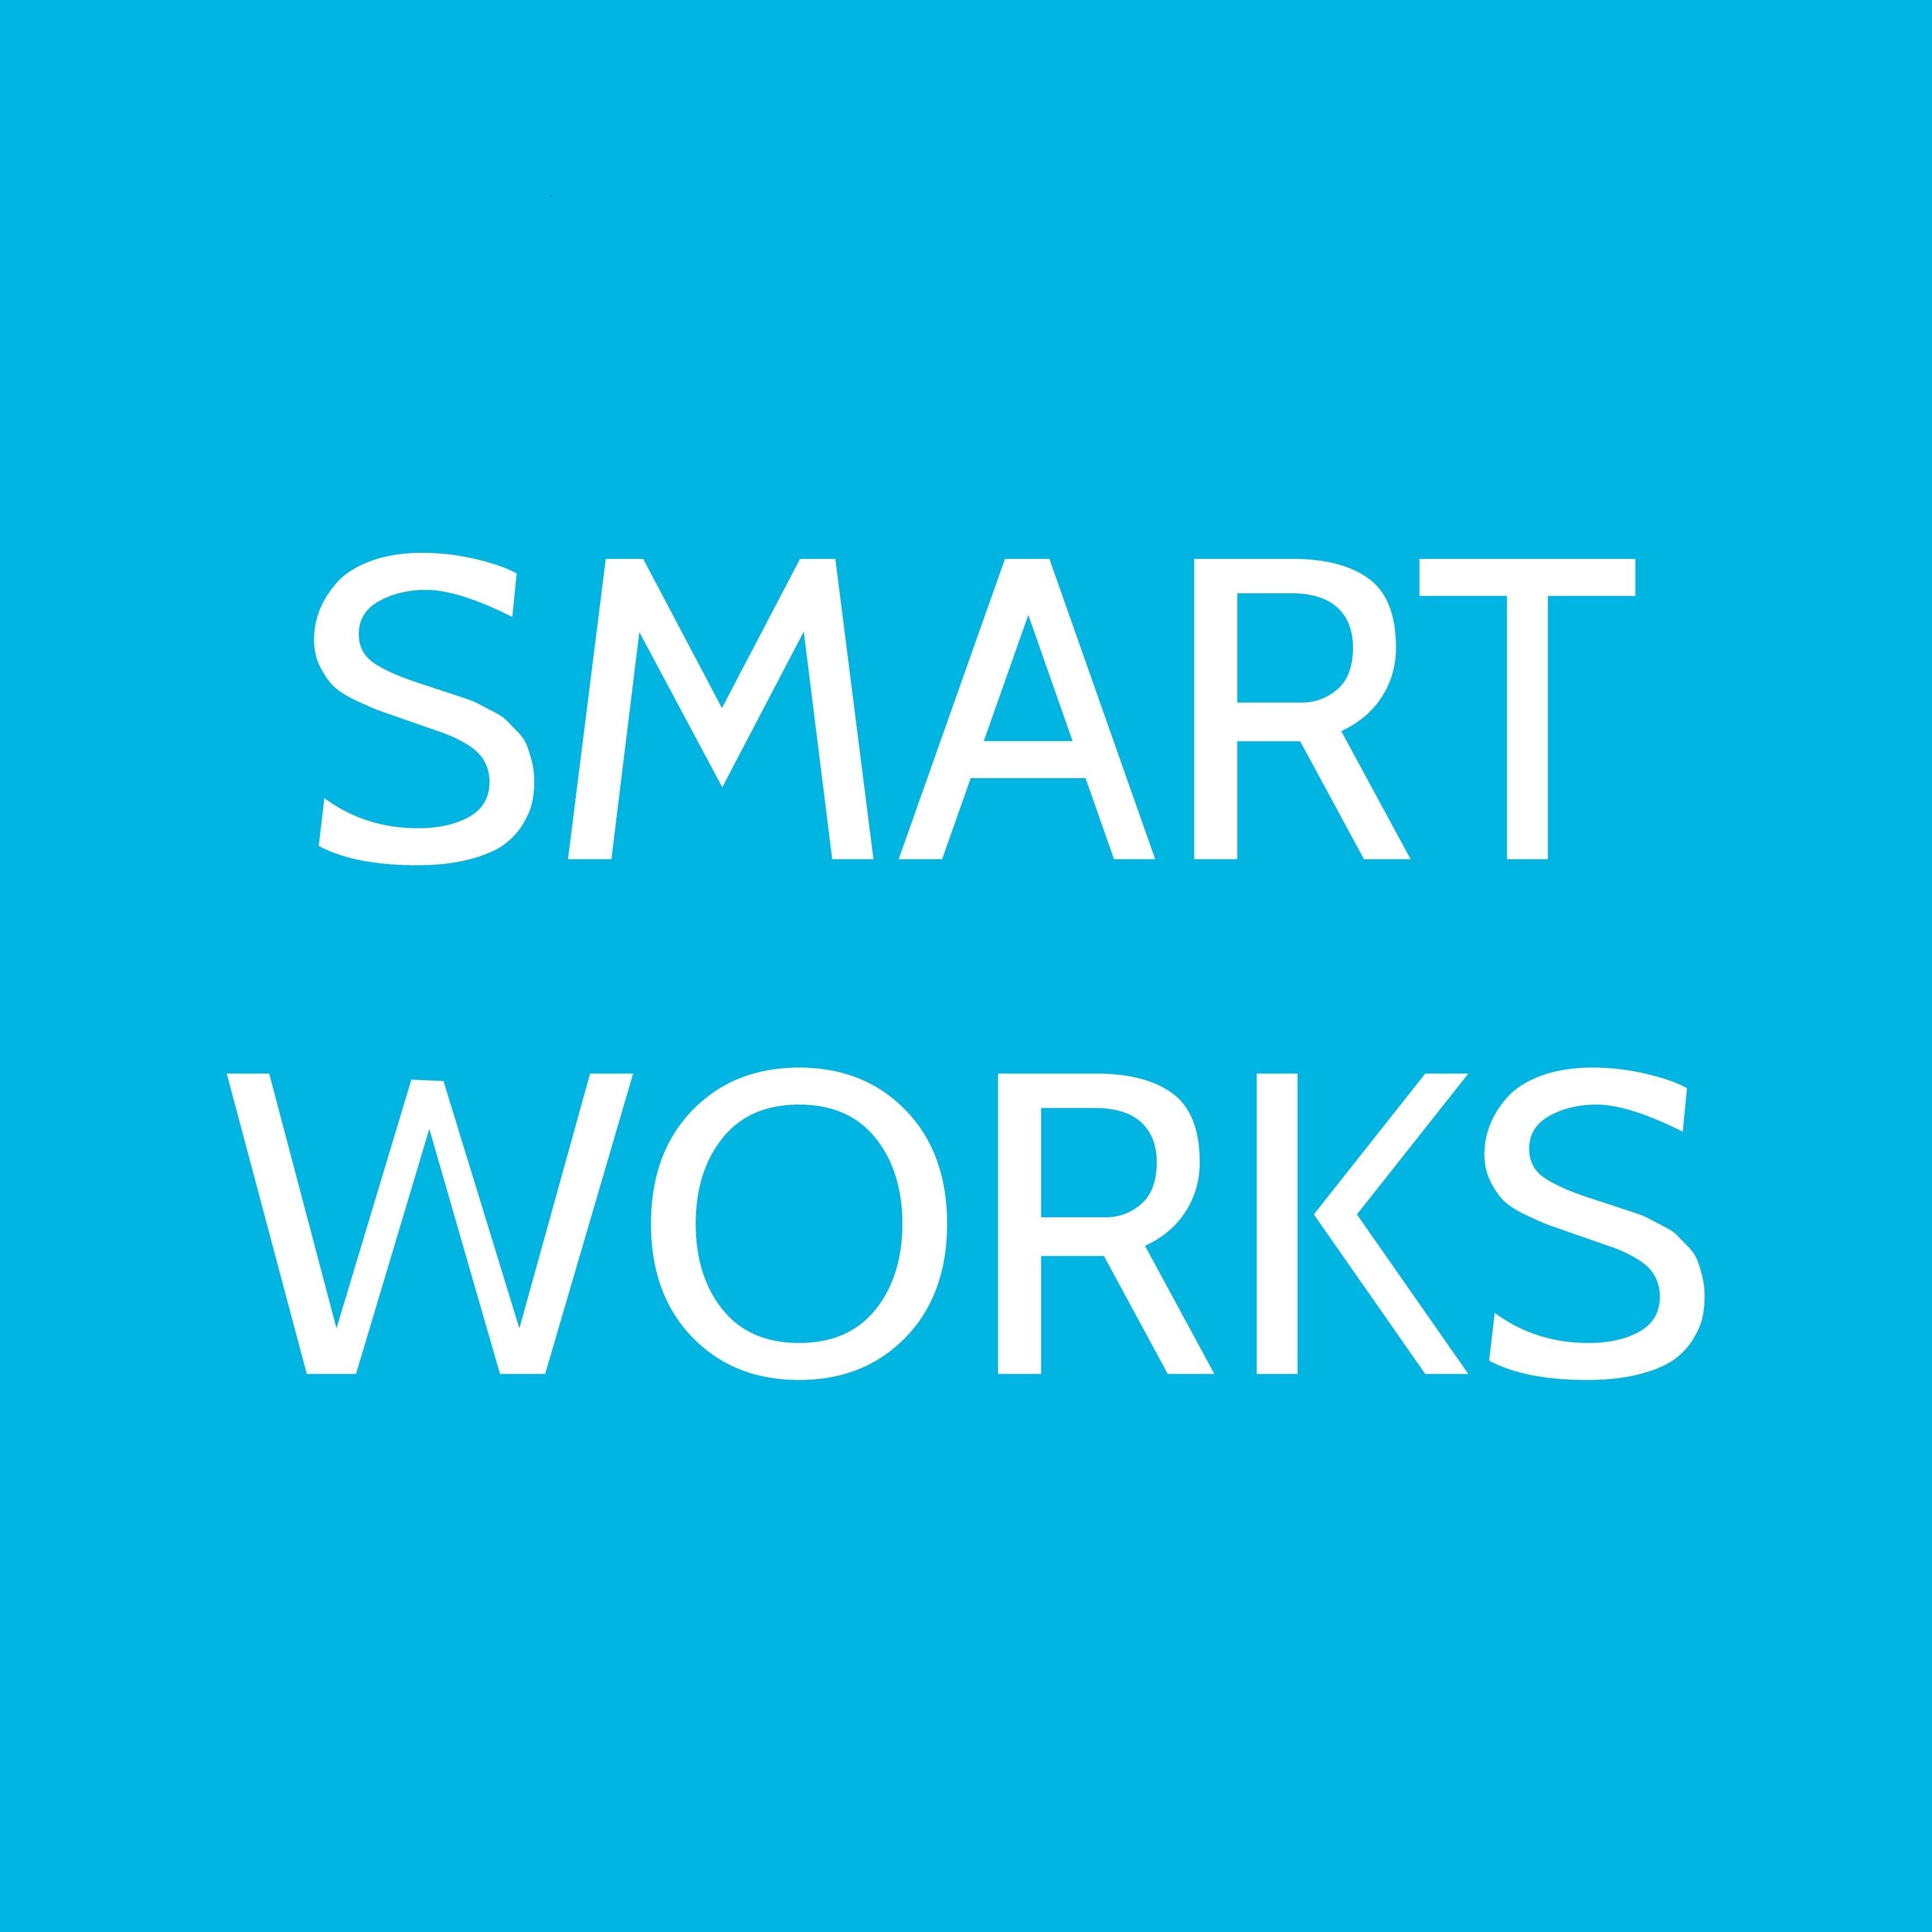 Smart Works Square